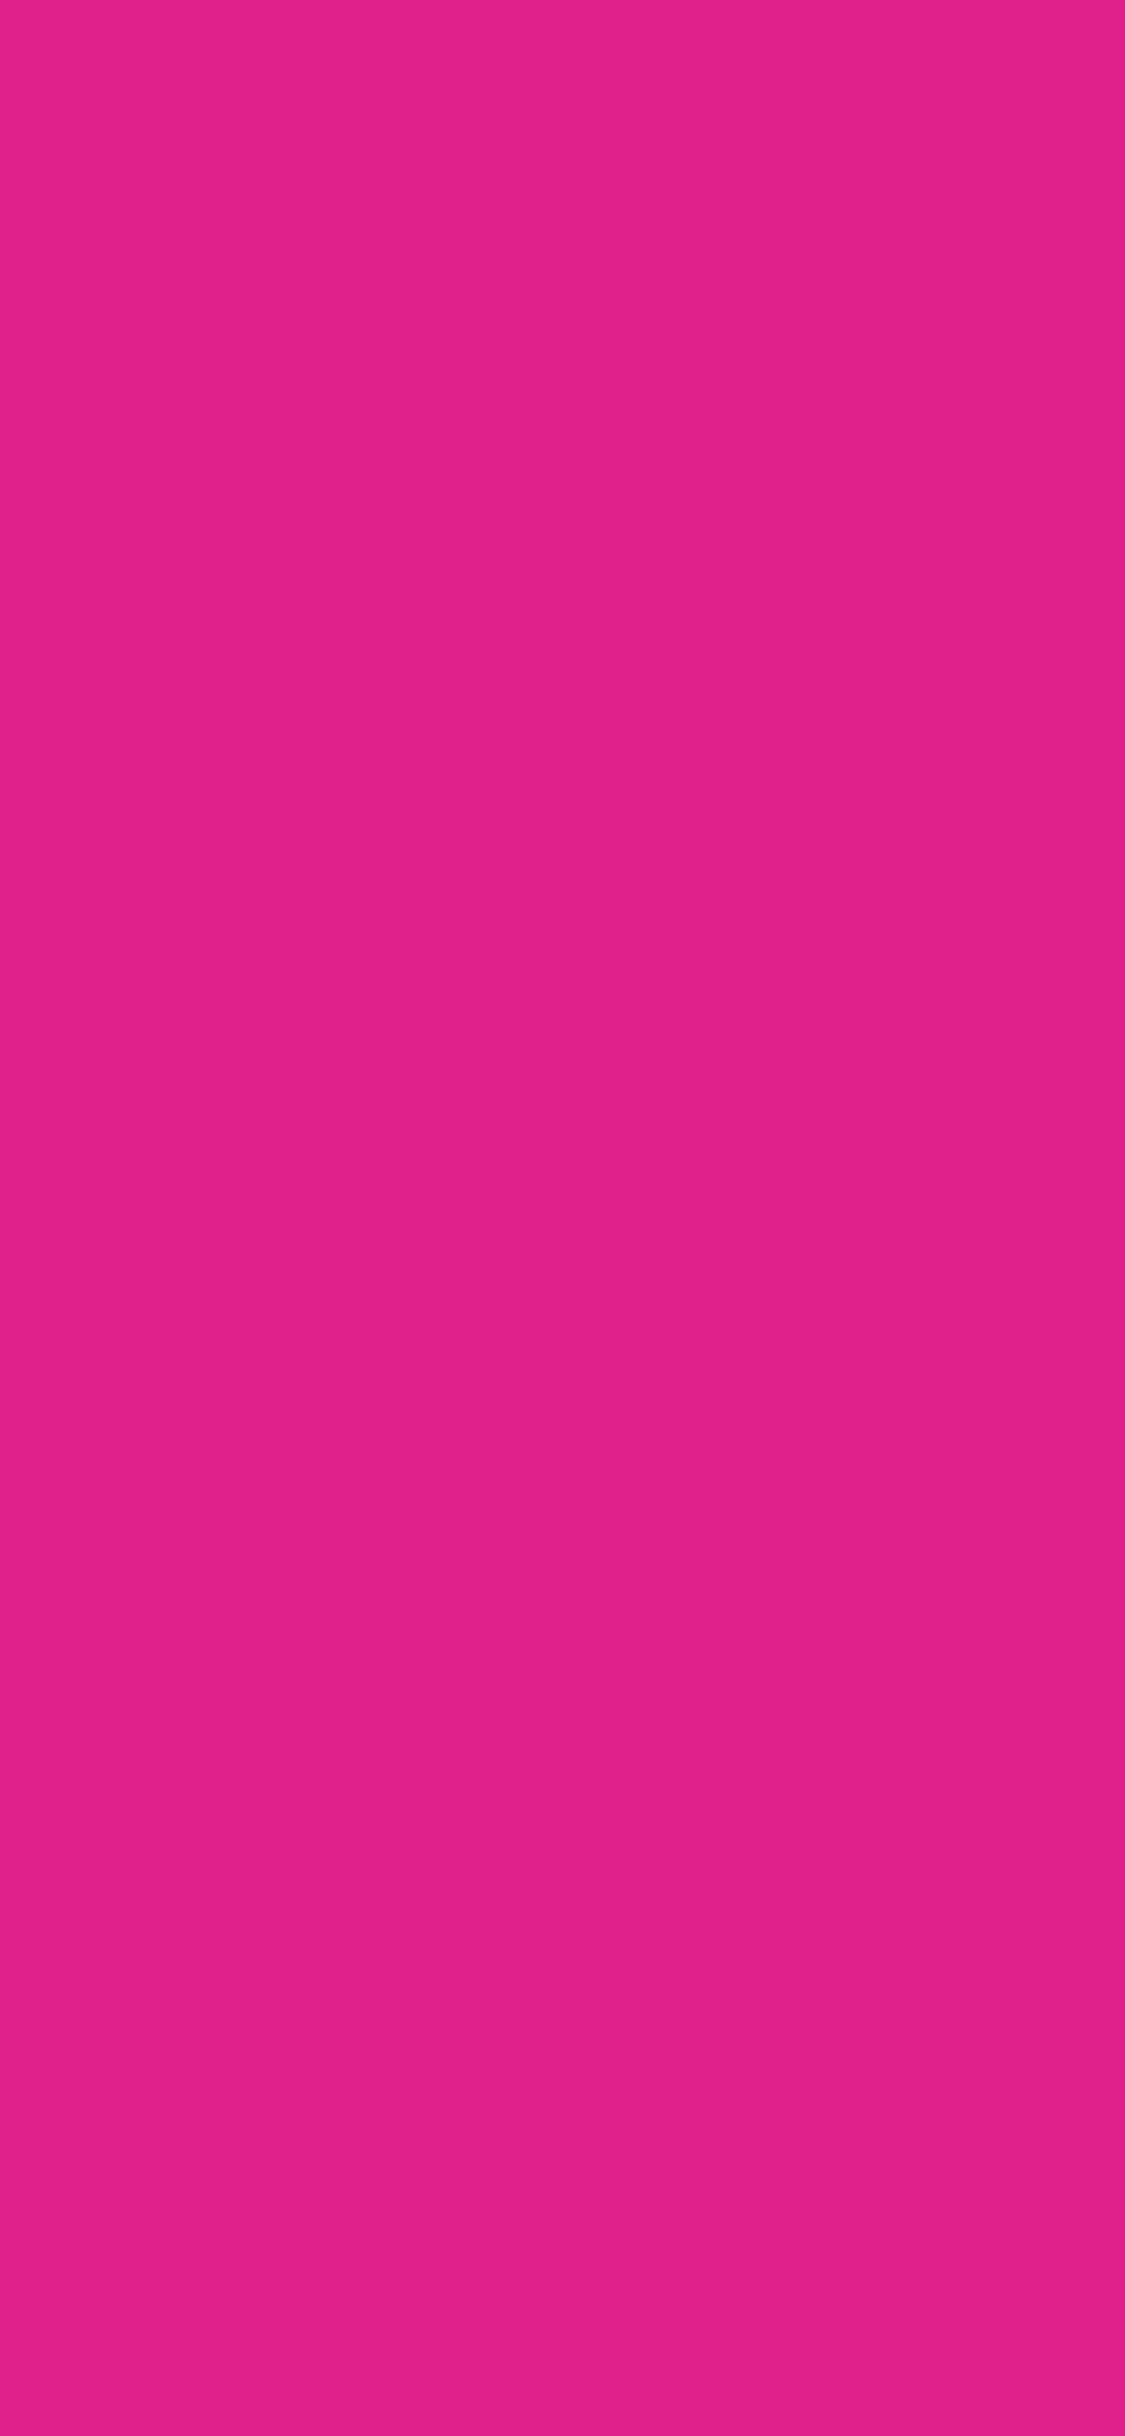 1125x2436 Barbie Pink Solid Color Background